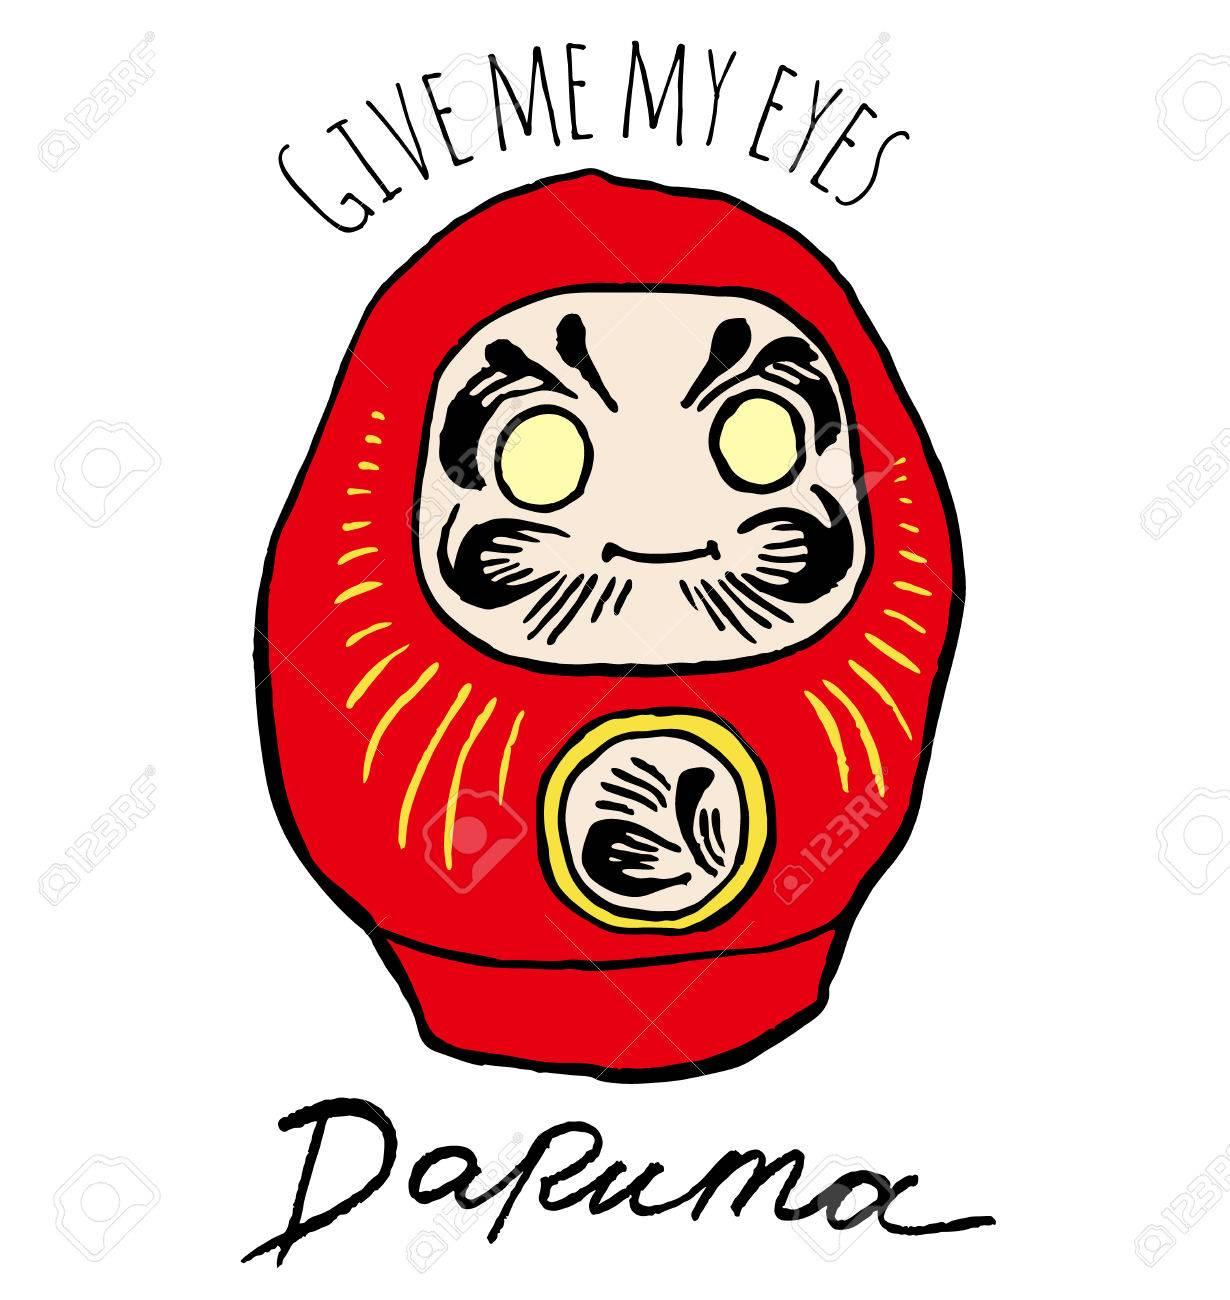 Daruma doll dharma japanese traditional doll symbol of daruma doll dharma japanese traditional doll symbol of perseverance popular gift encouragement biocorpaavc